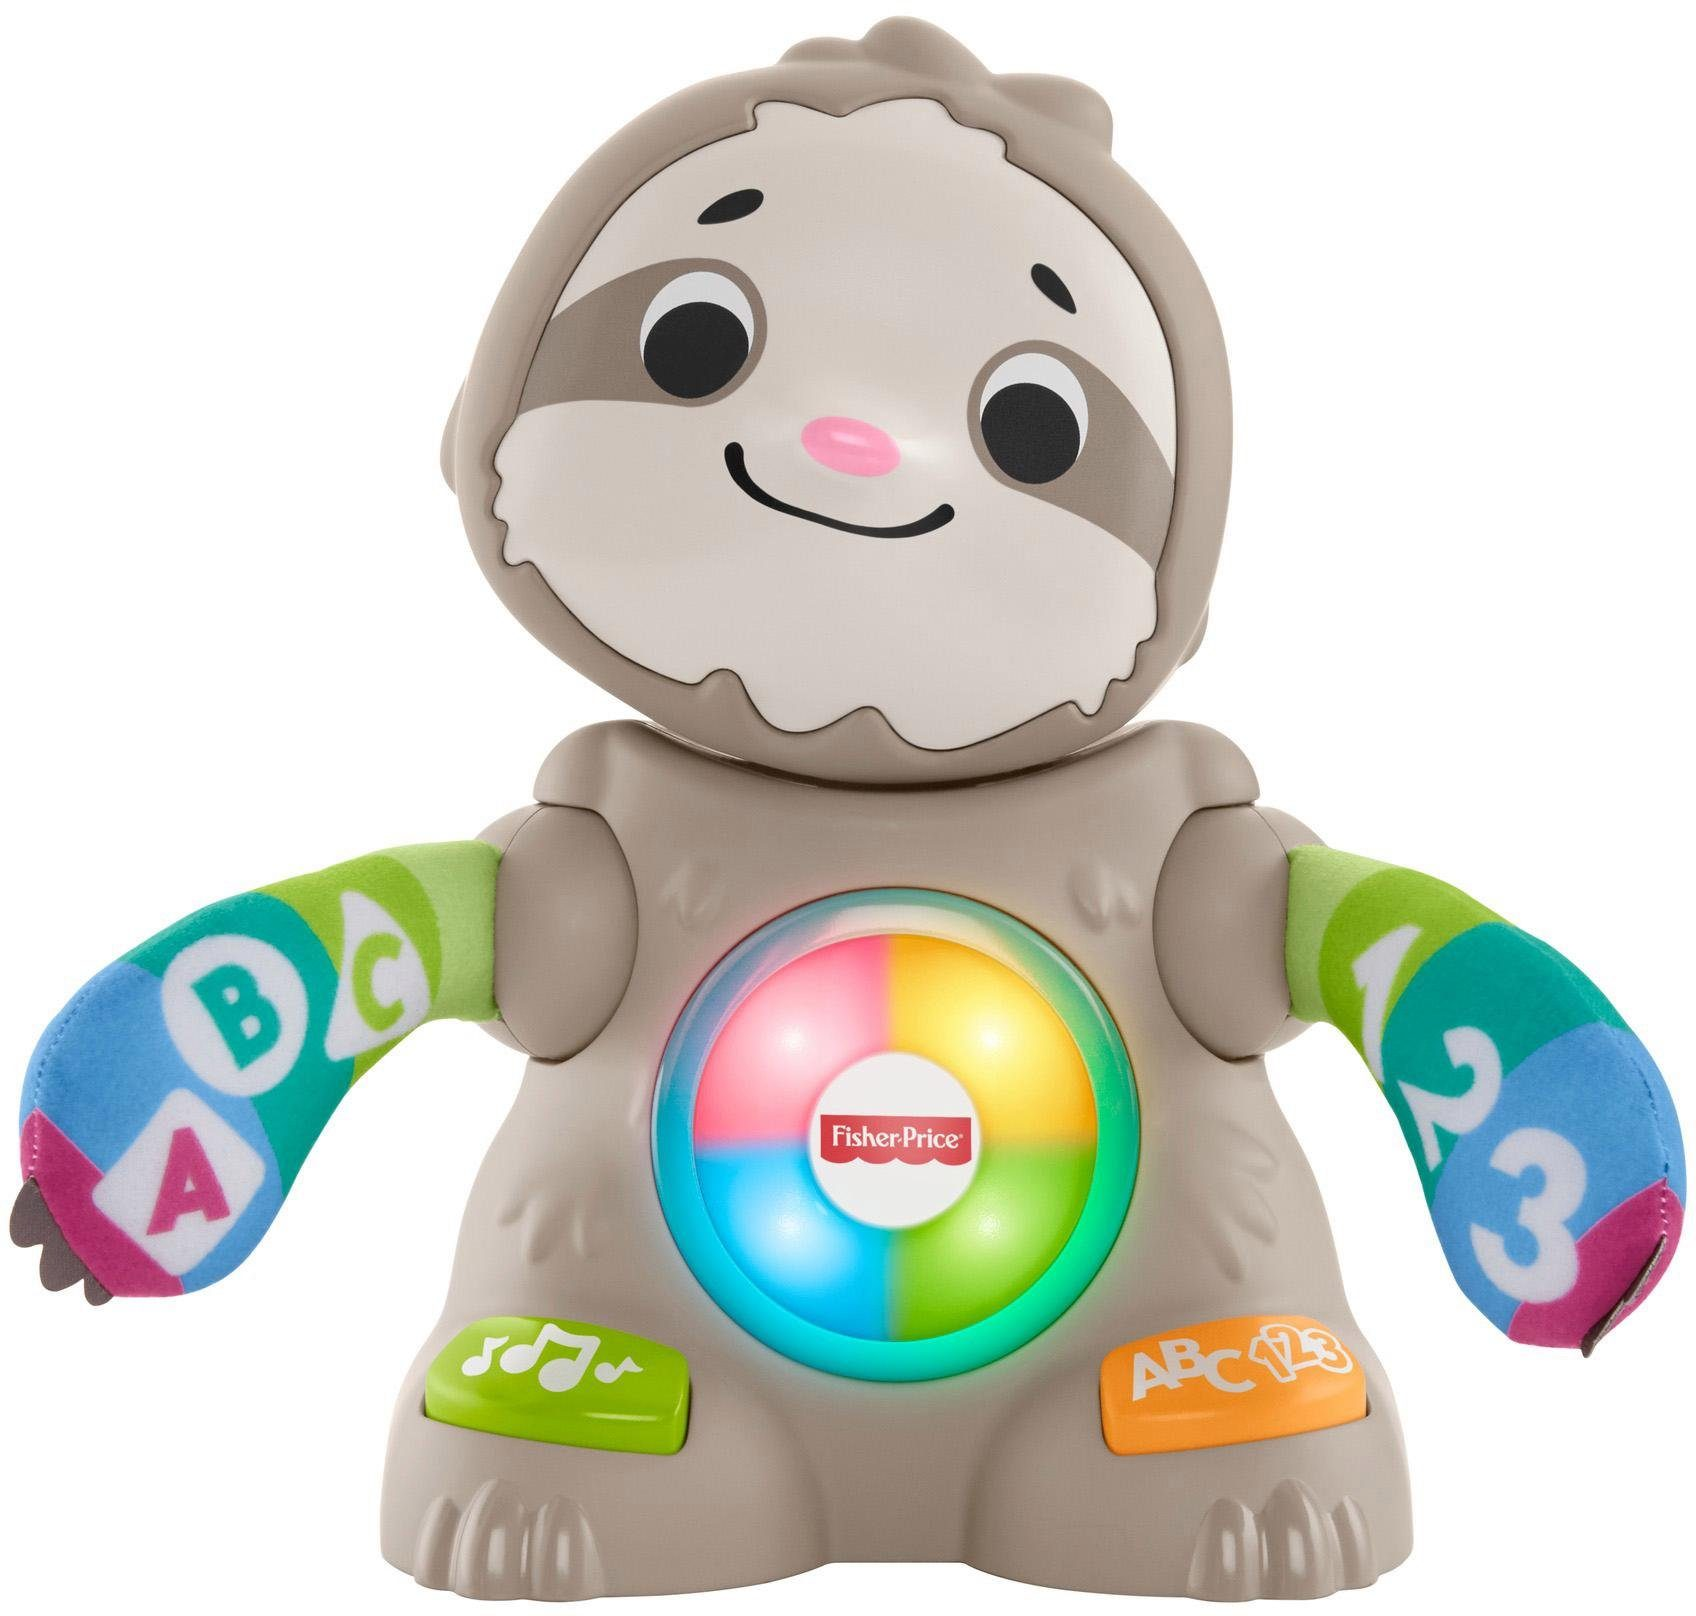 Fisher-Price Lernspielzeug, BlinkiLinkis Faultier bunt Kinder Lernspiele Lernspielzeug